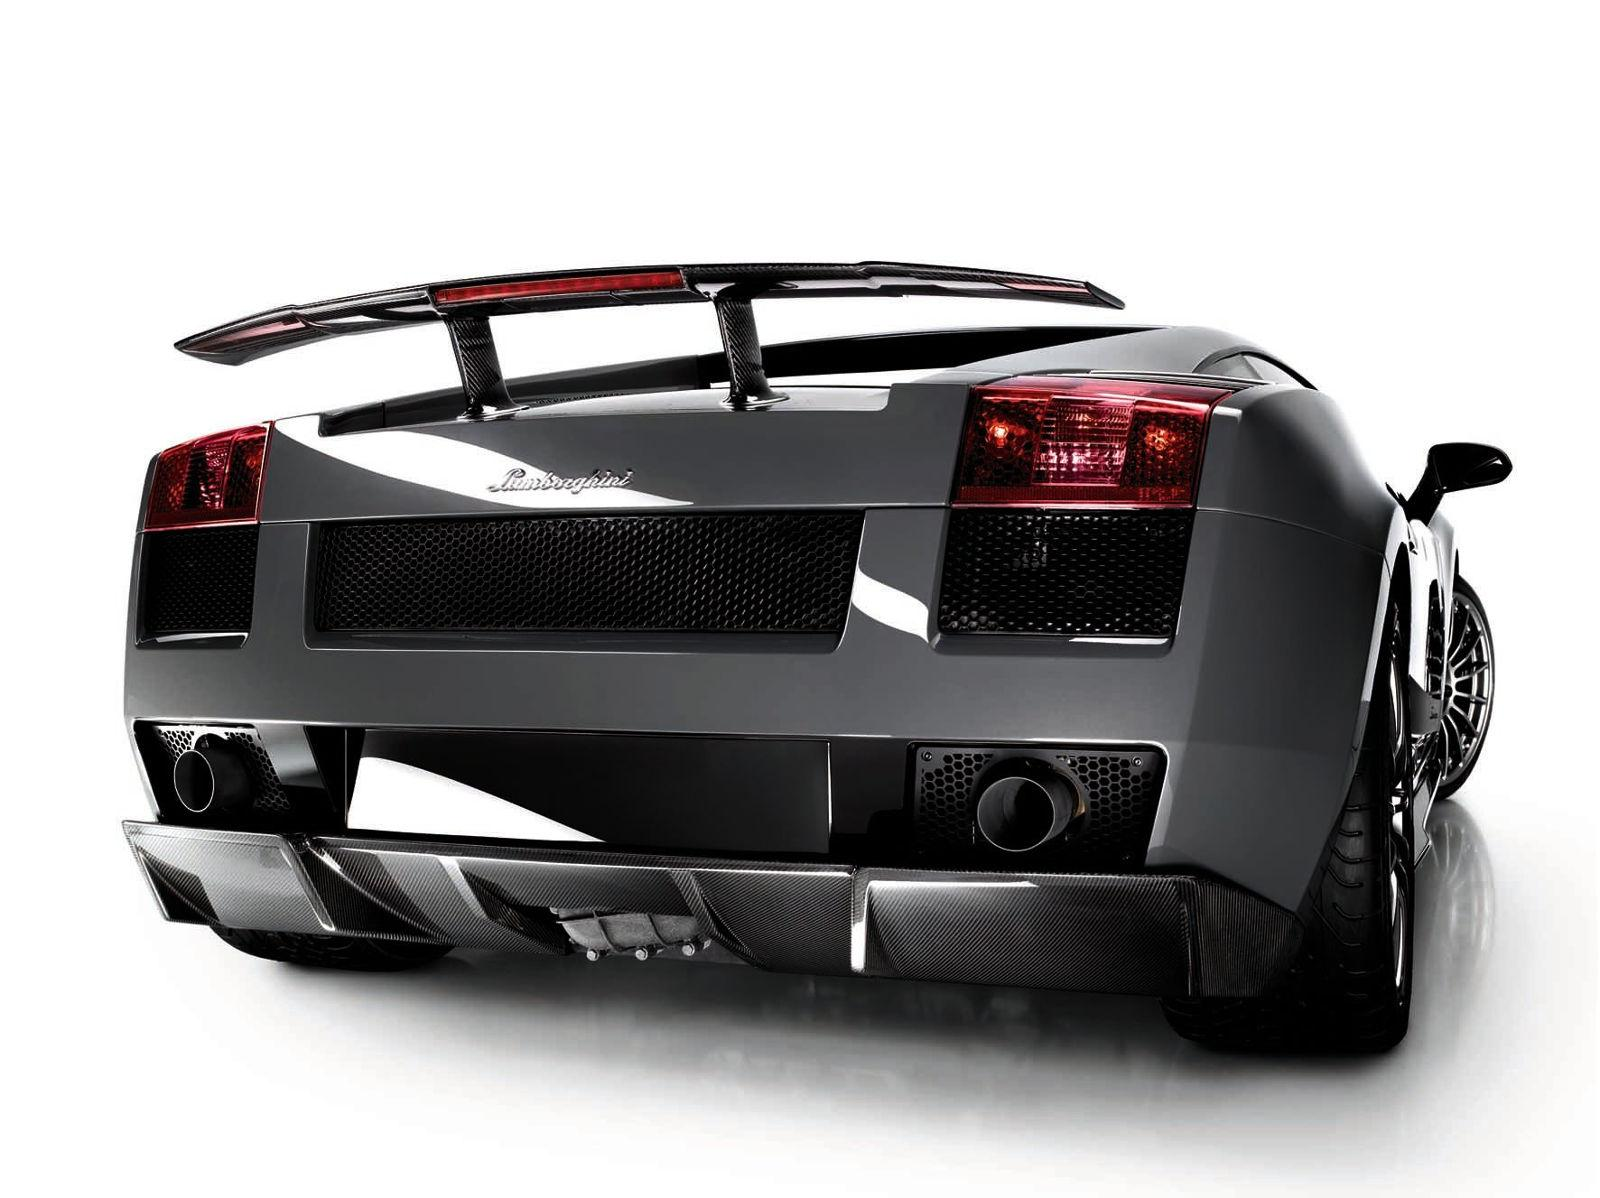 Lamborghini Gallardo Superleggera - Heckansicht